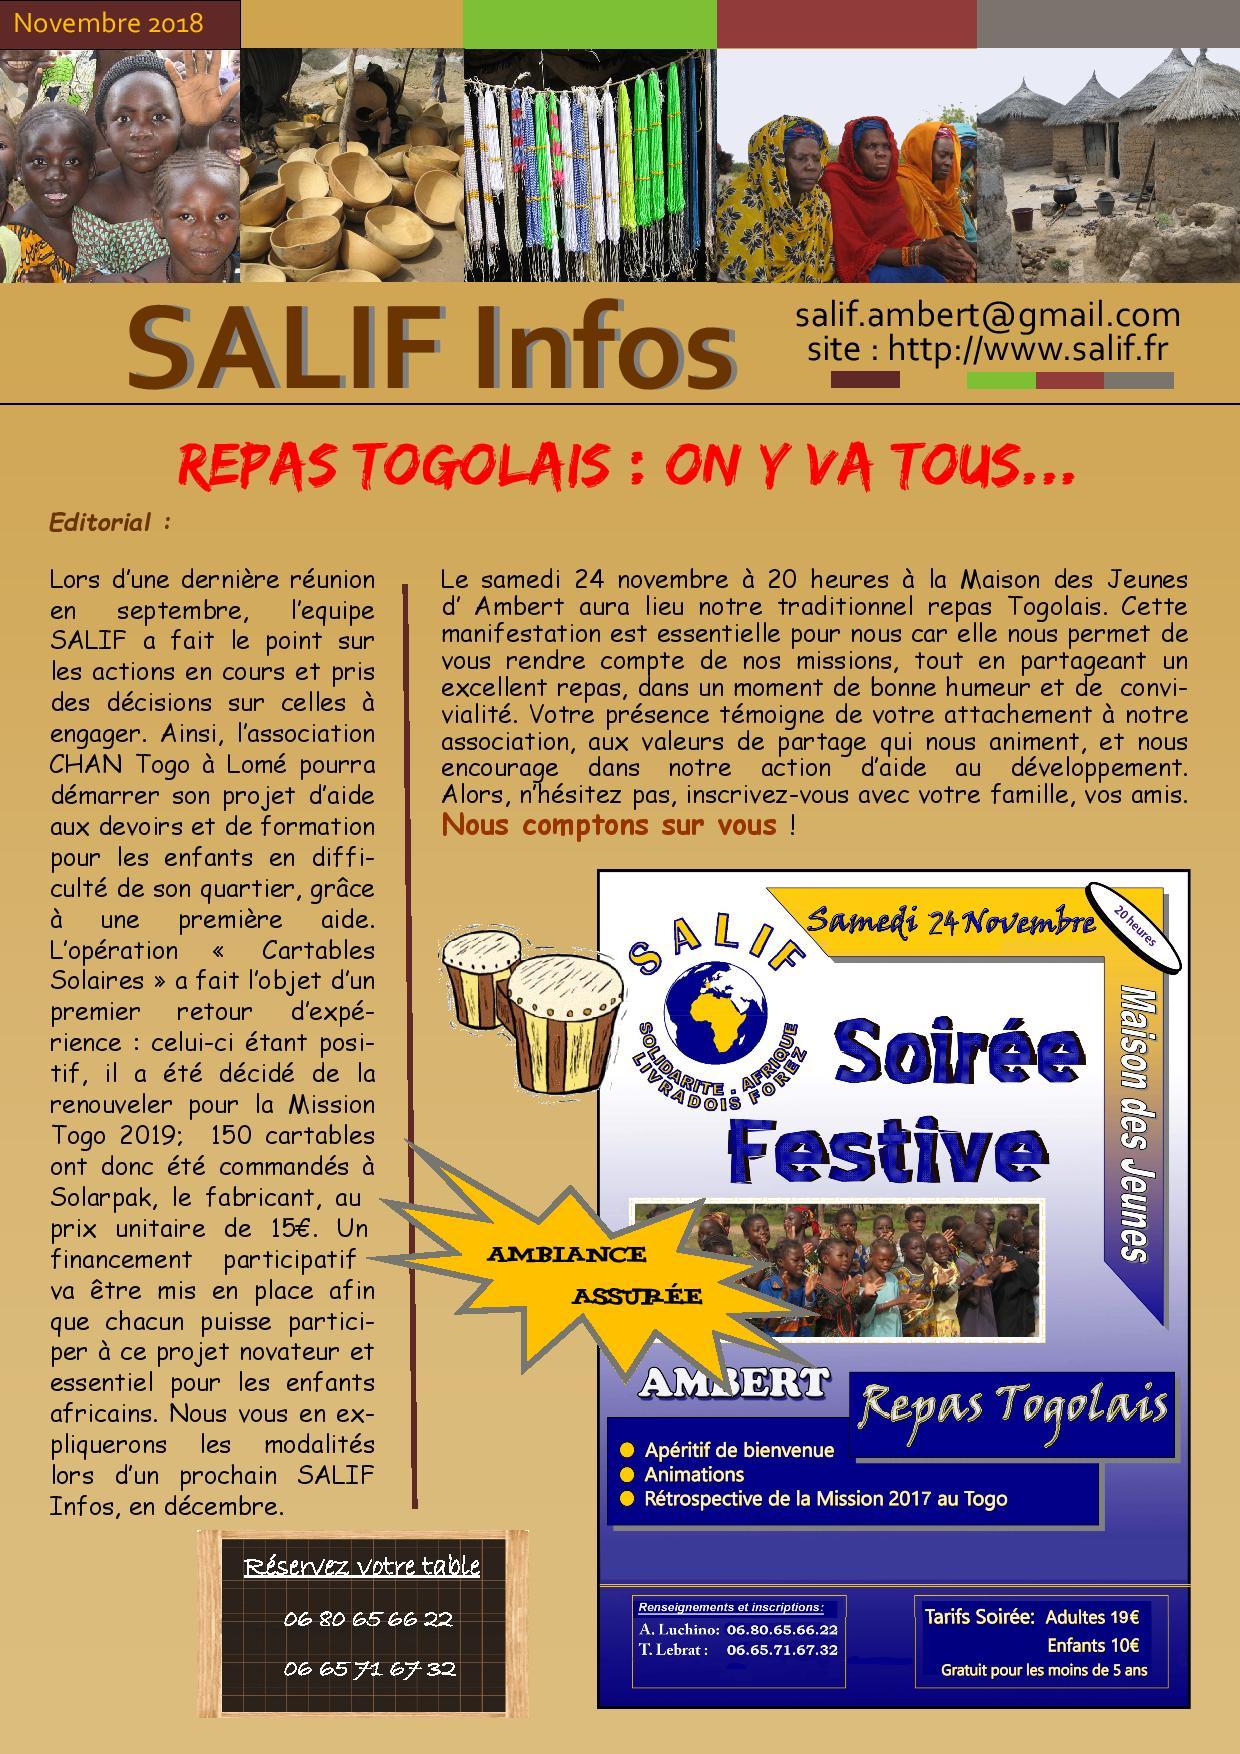 Salif infos novembre 2018-page-001